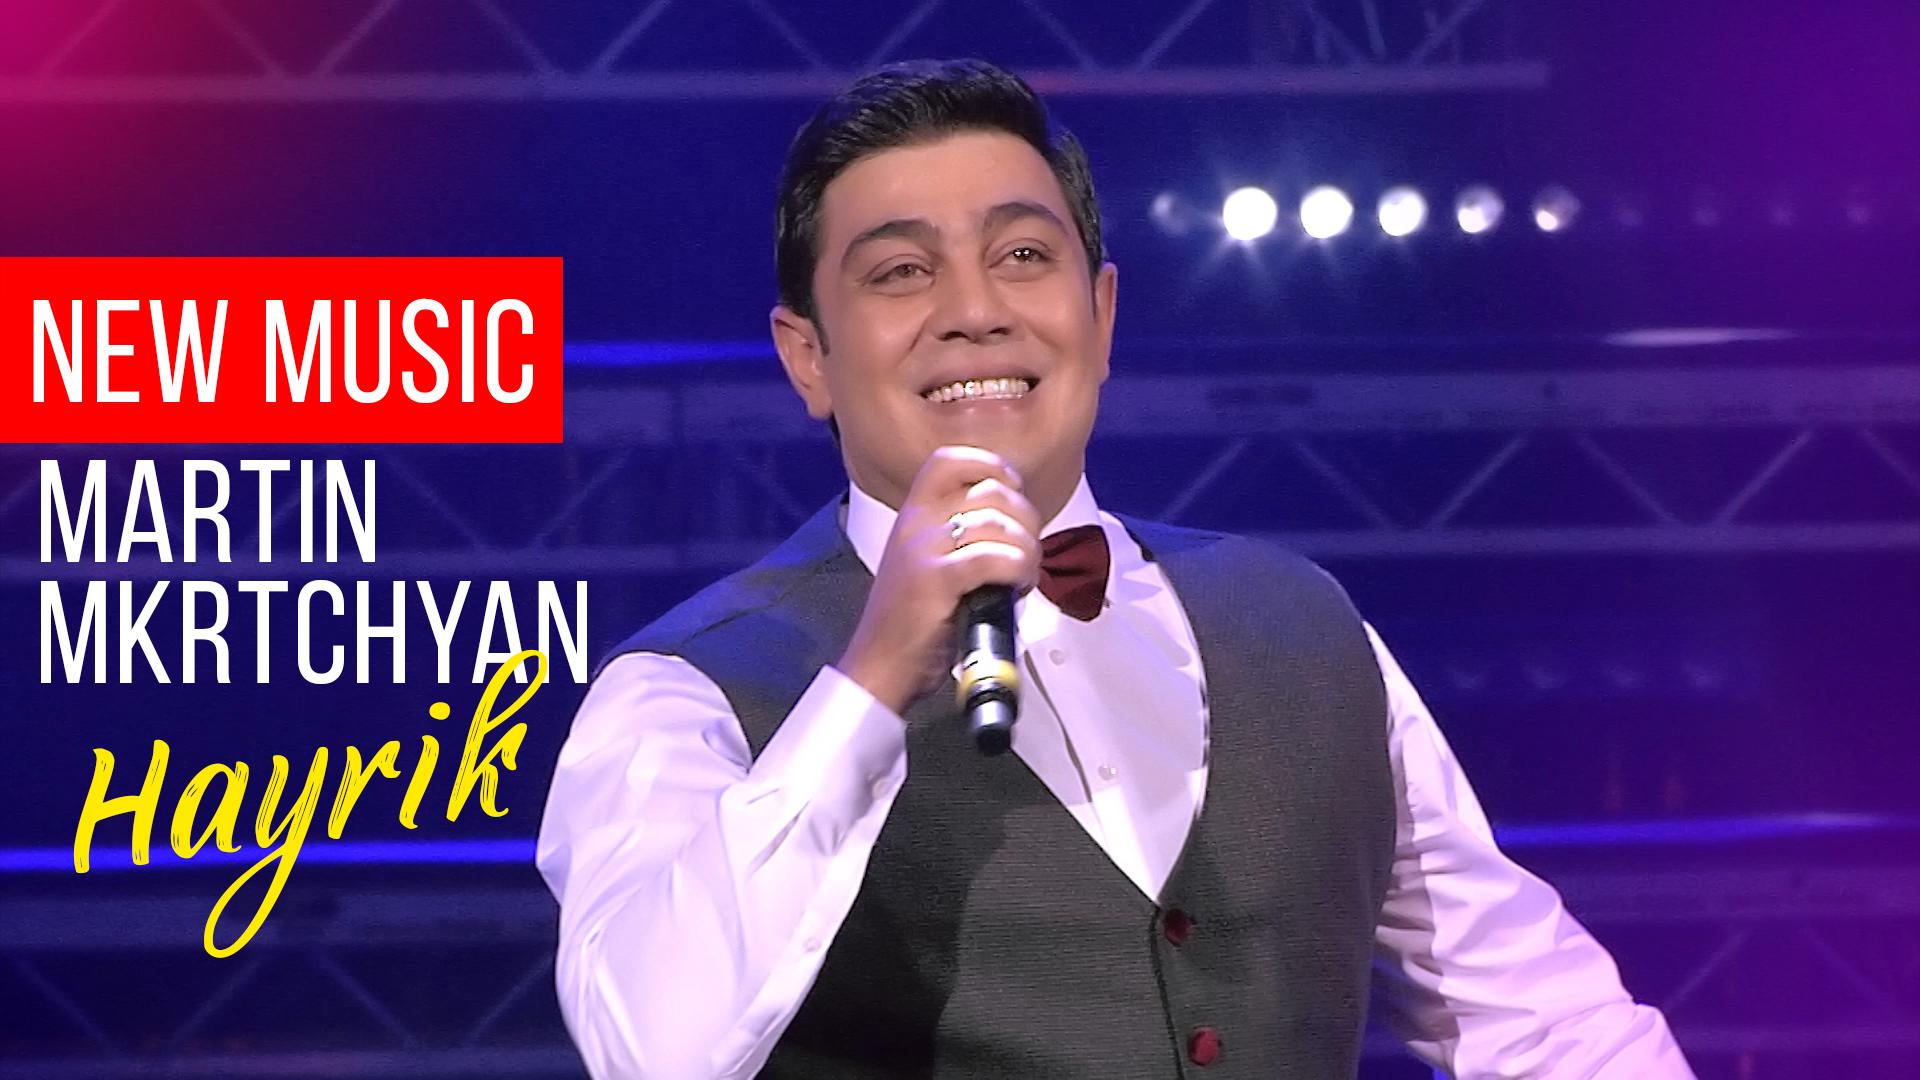 Martin Mkrtchyan – Hayrik